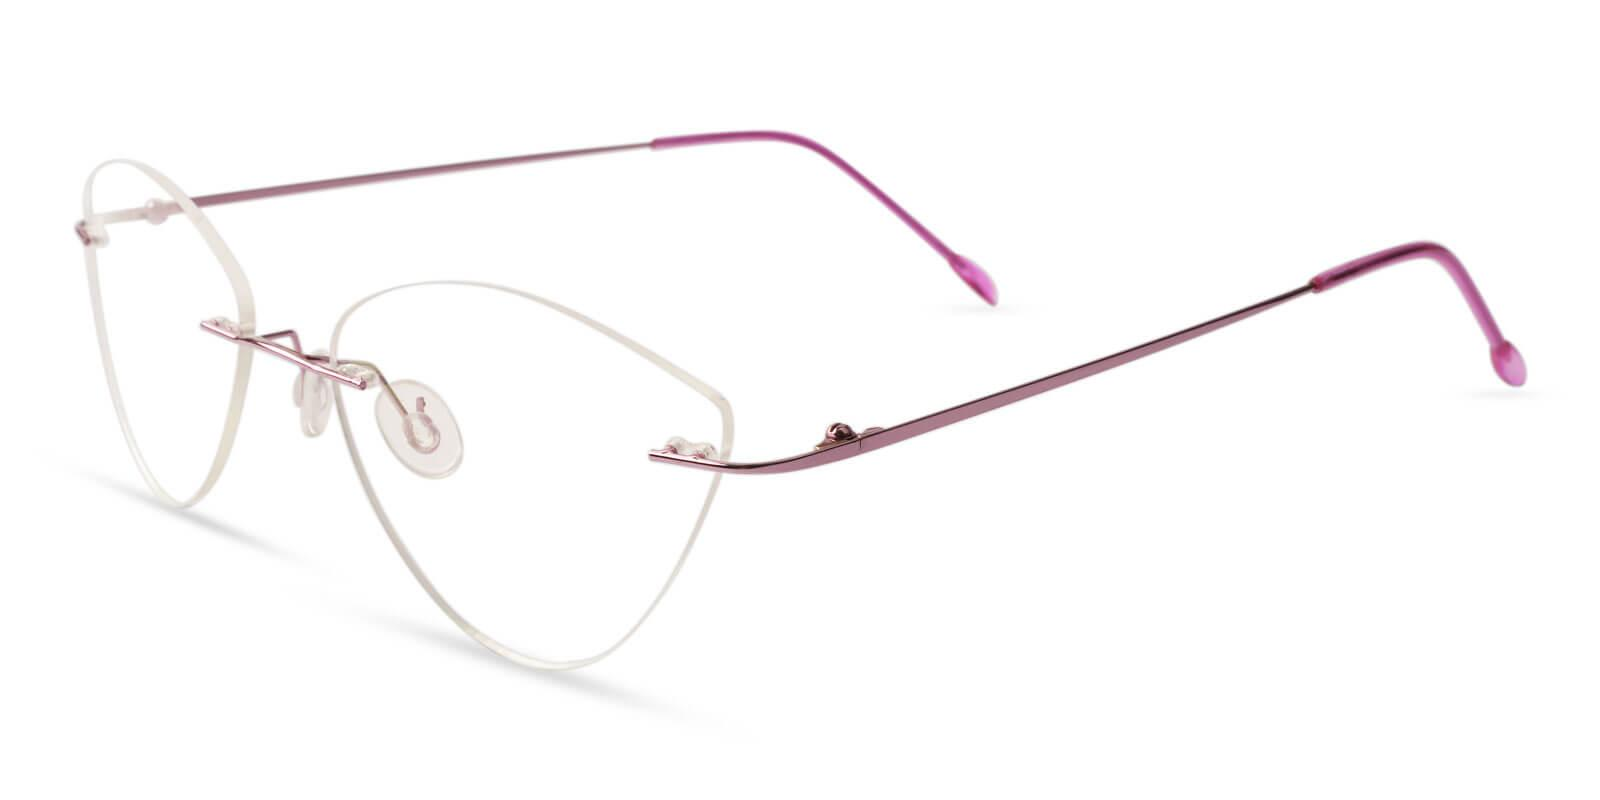 Huguenot Pink Metal Eyeglasses , NosePads Frames from ABBE Glasses